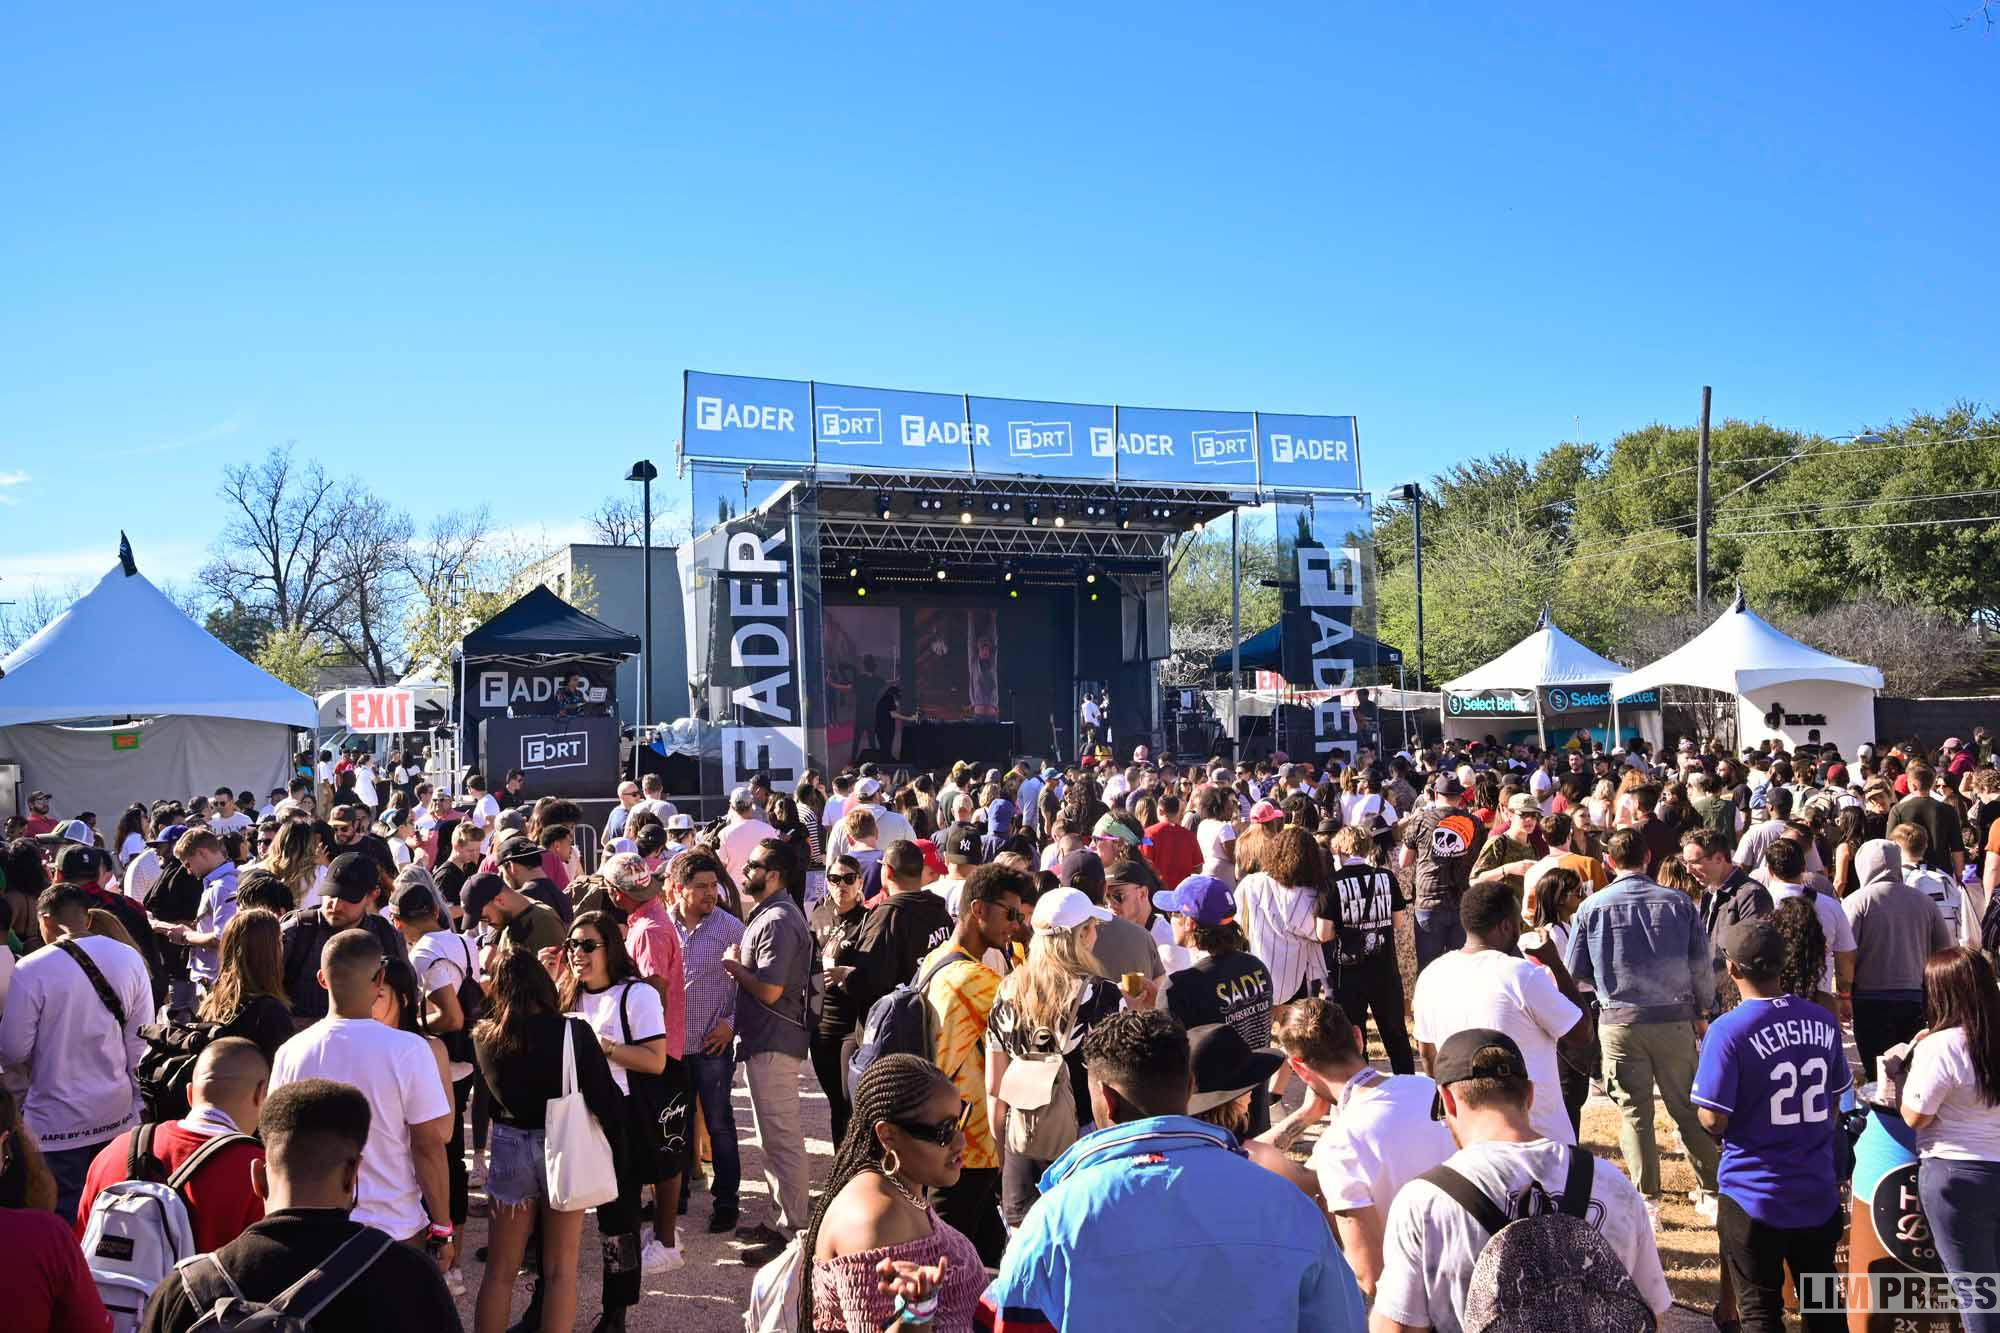 SXSW Music Festival 2019 ライヴレポート Part 2